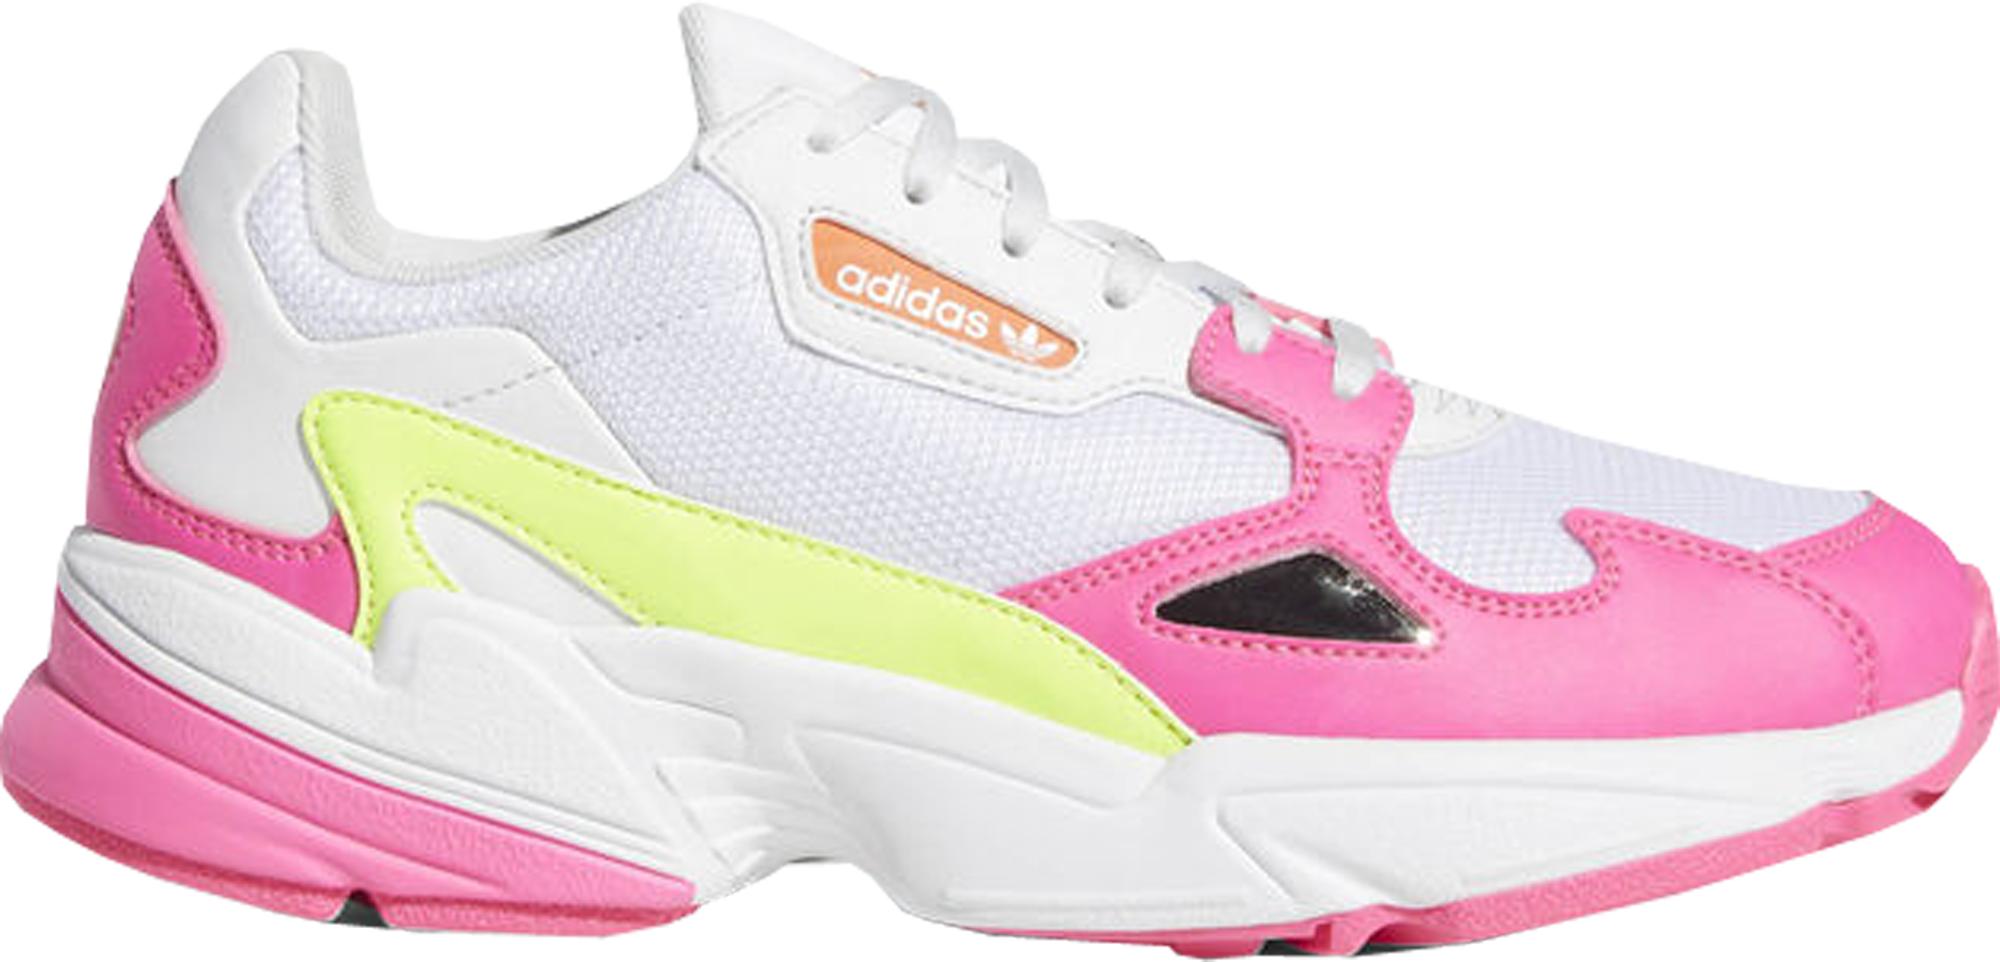 adidas Falcon Shock Pink Solar Yellow